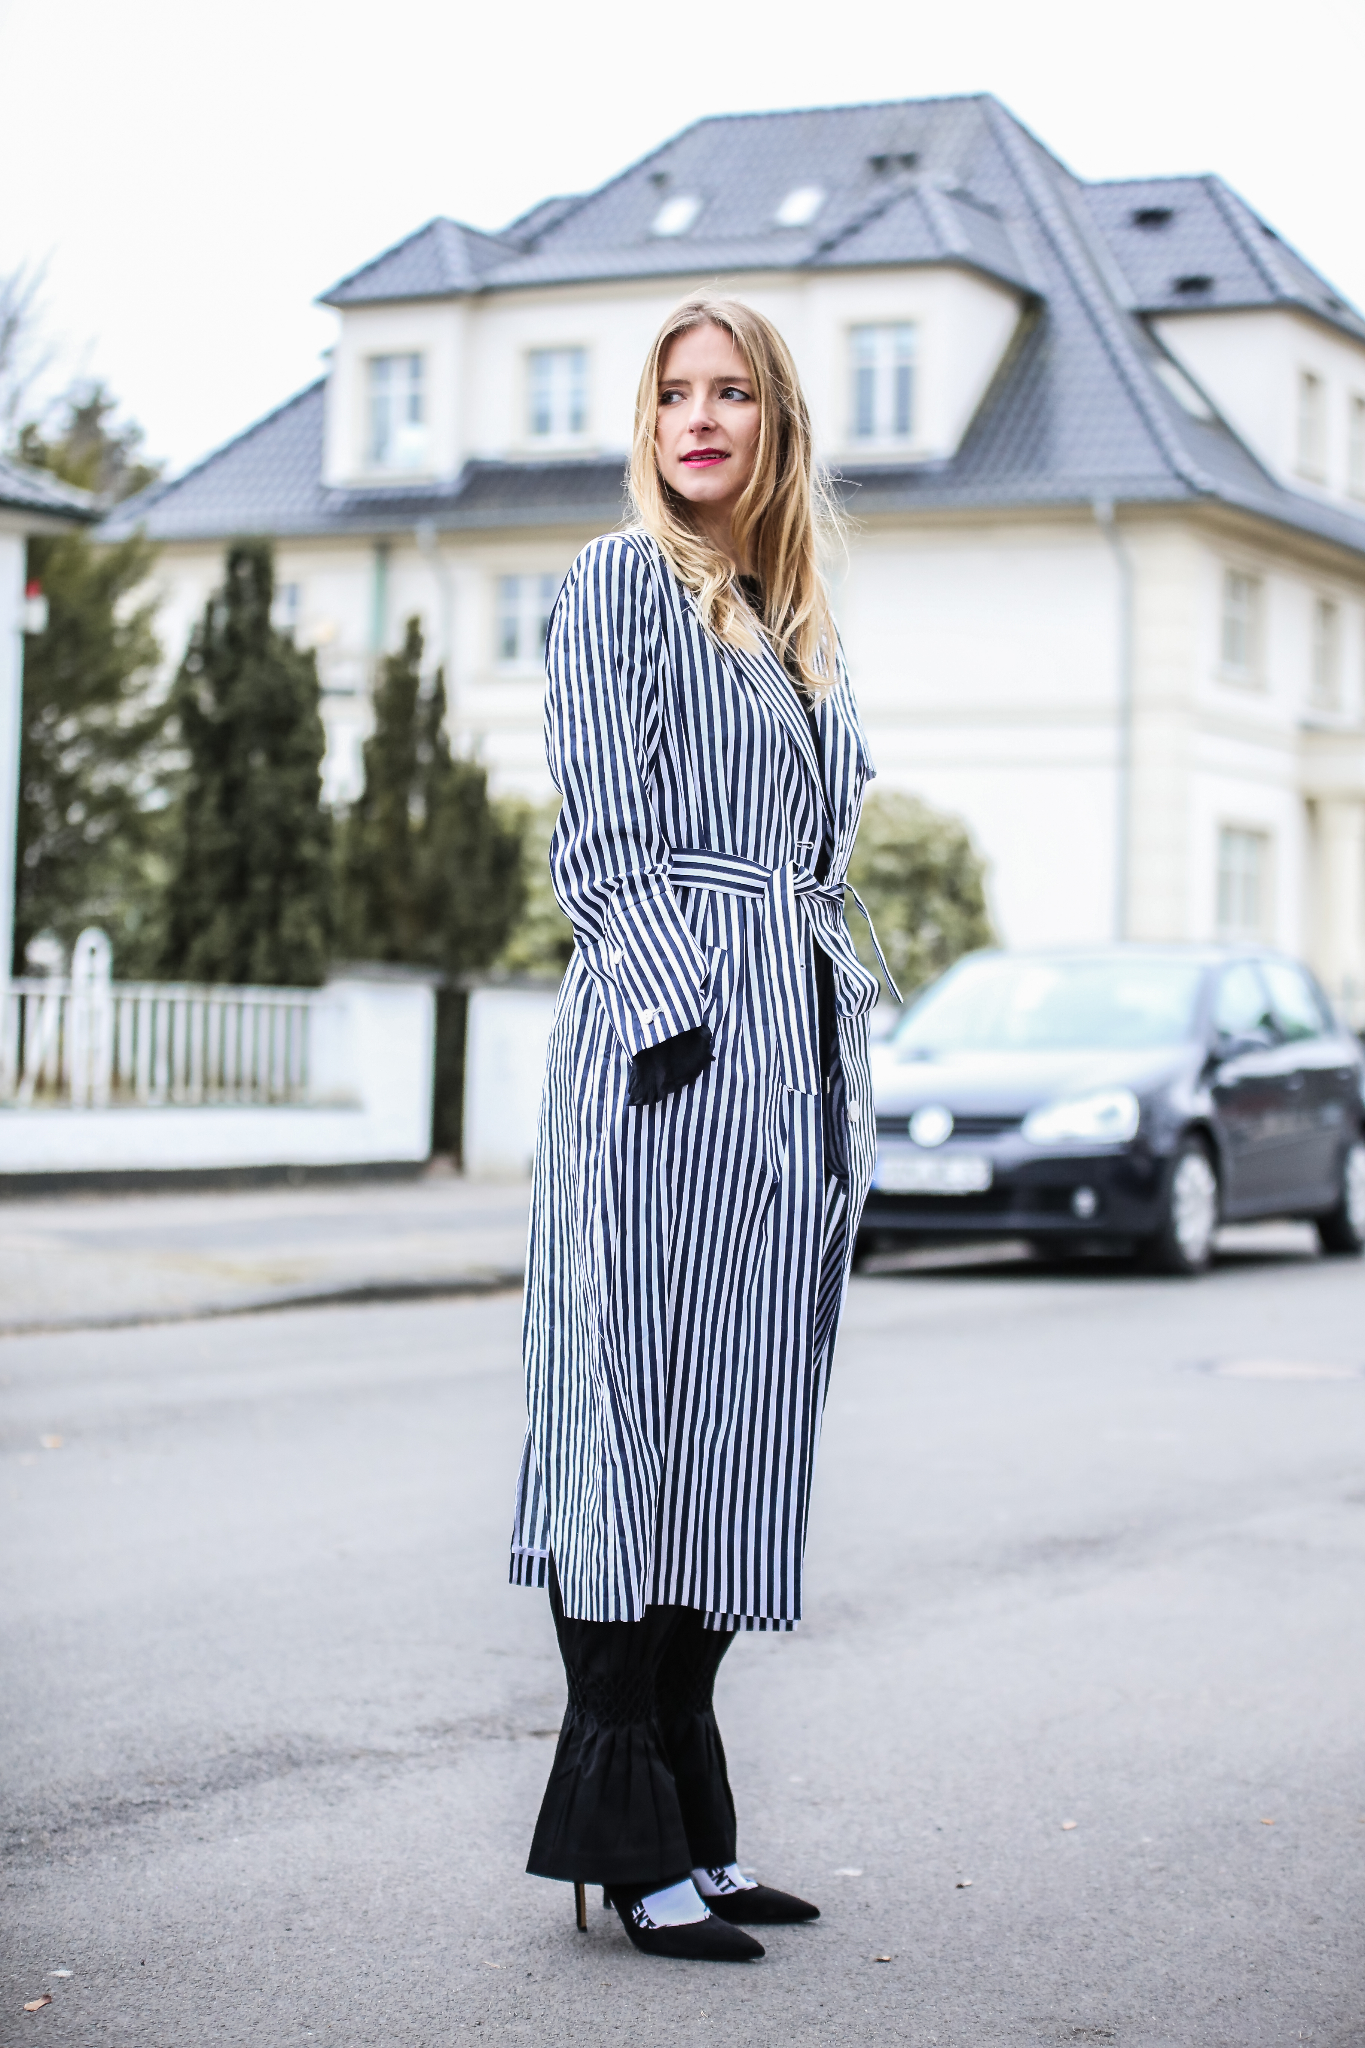 MOD-by-Monique-Fashion-Looks-Striped-Coat-Big-Volants-20